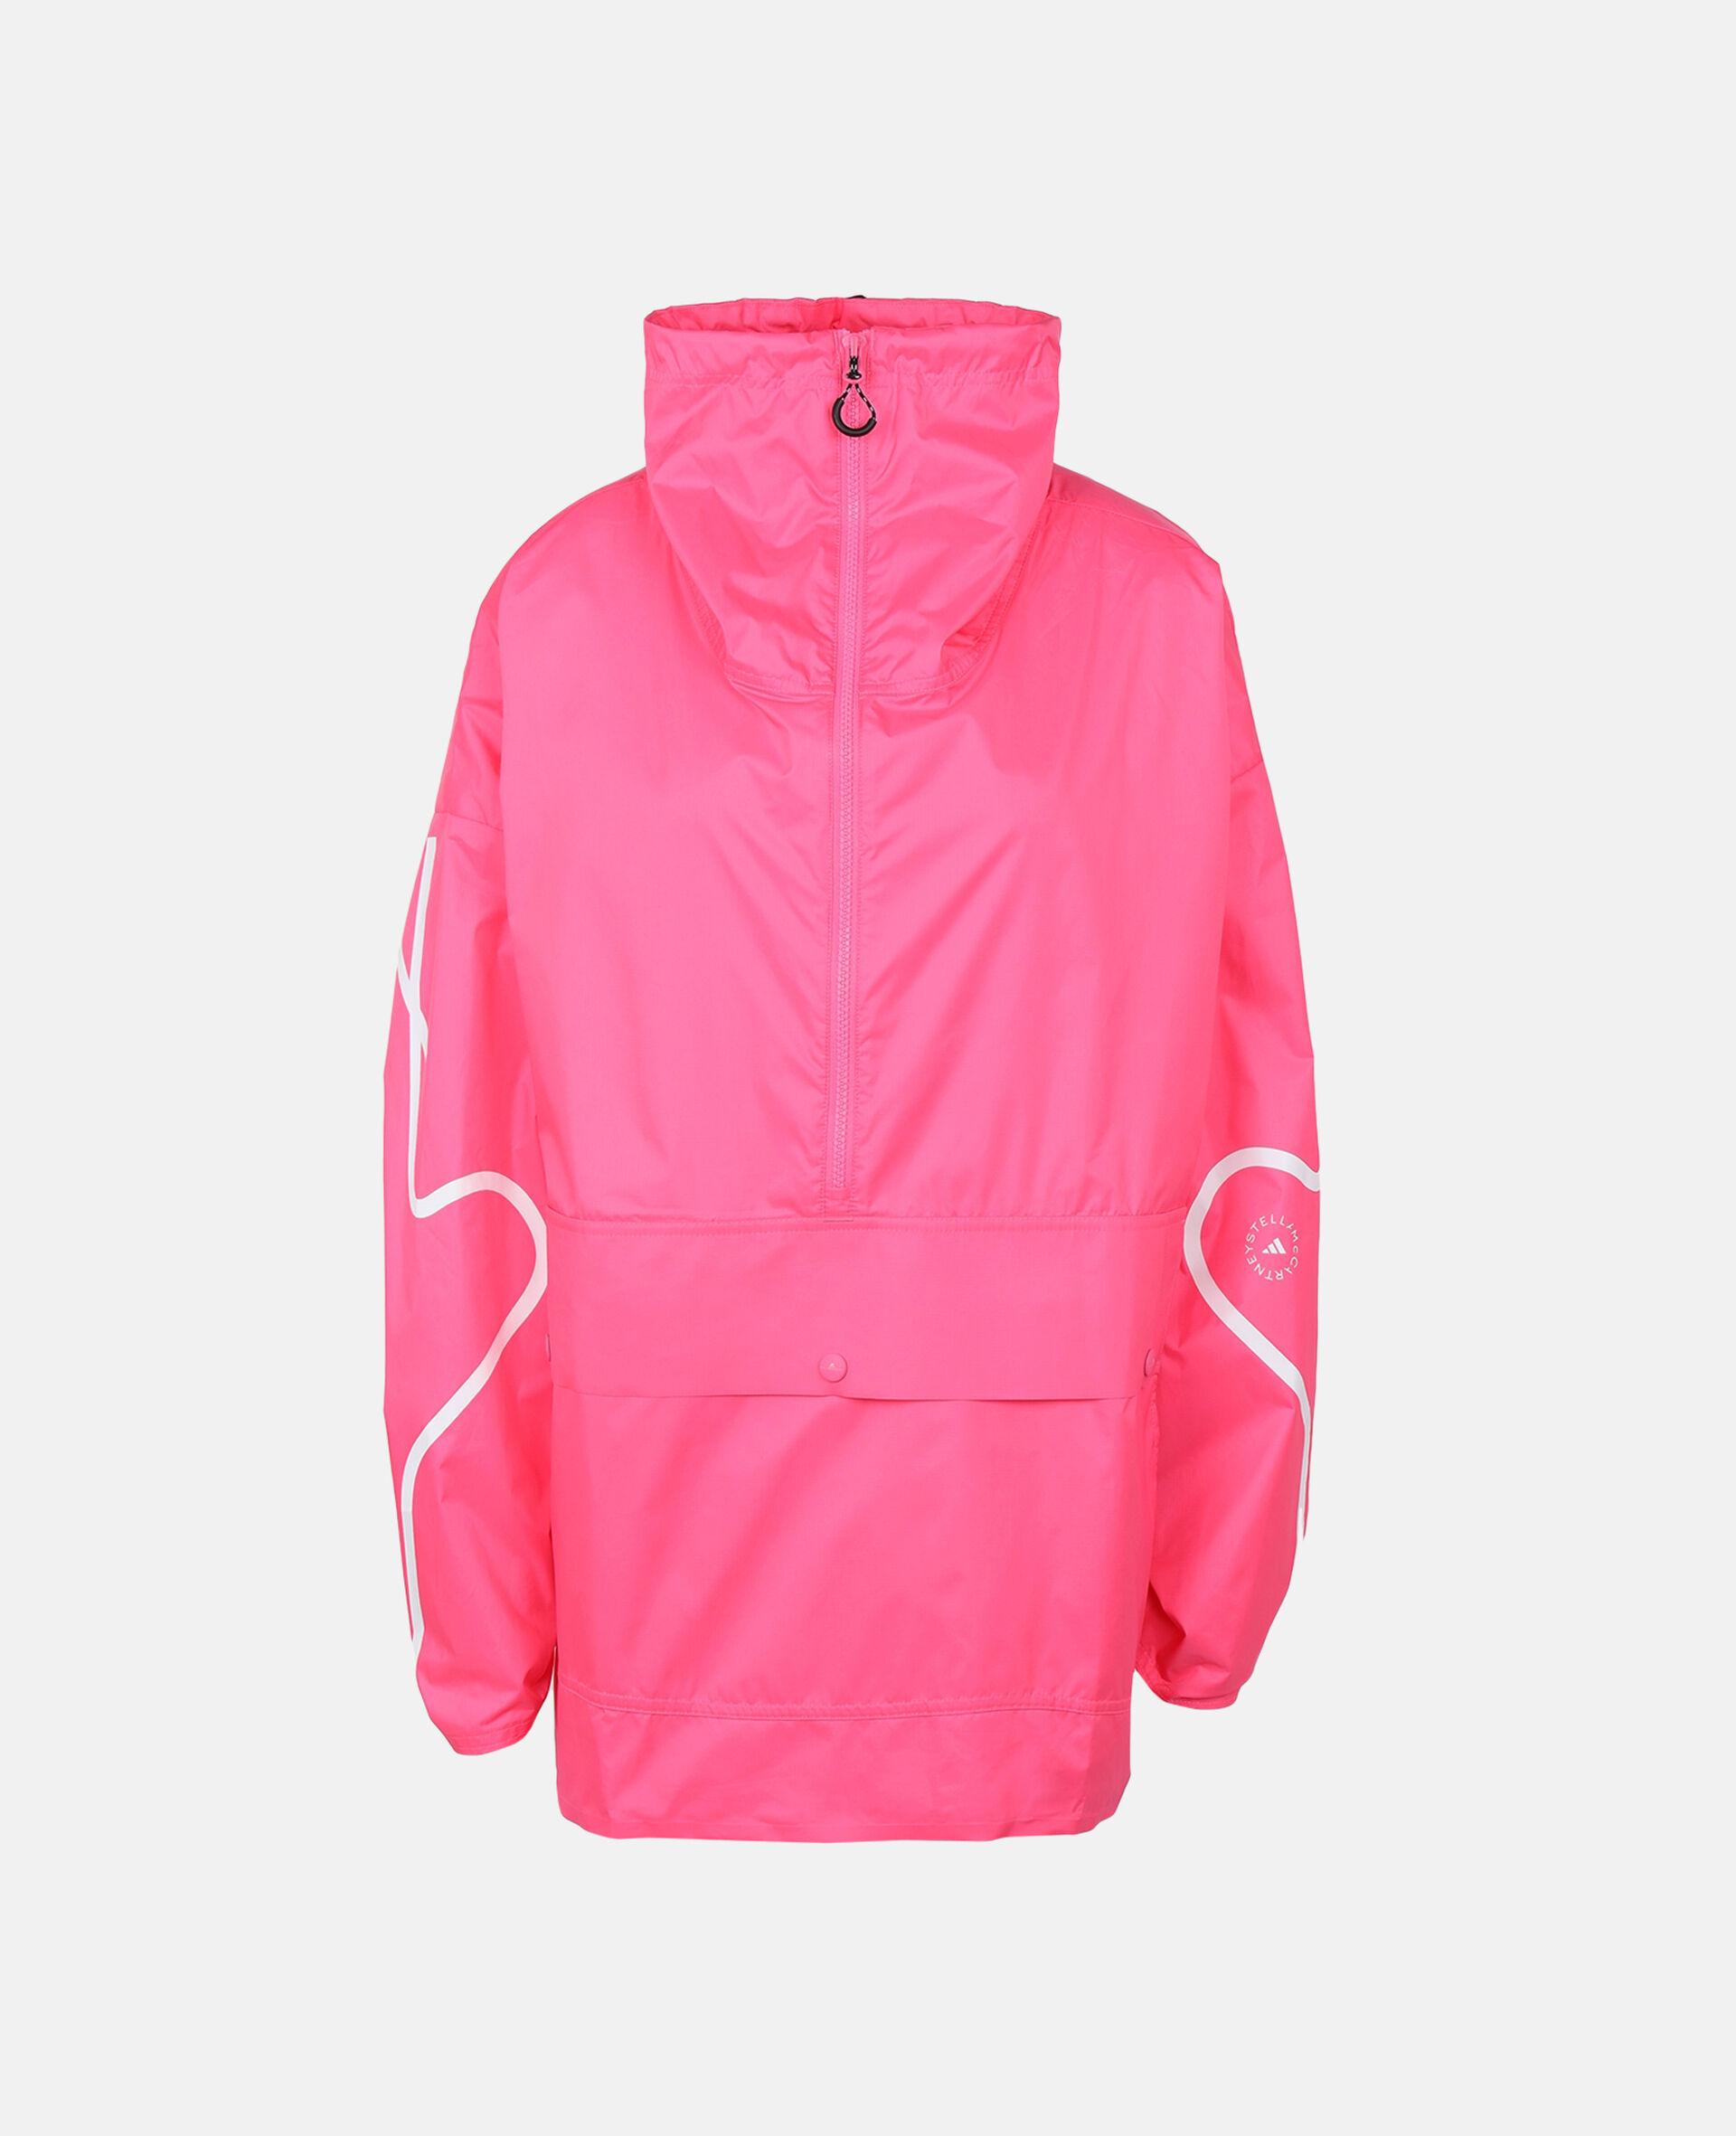 Pink Half-Zip Jacket-Pink-large image number 0